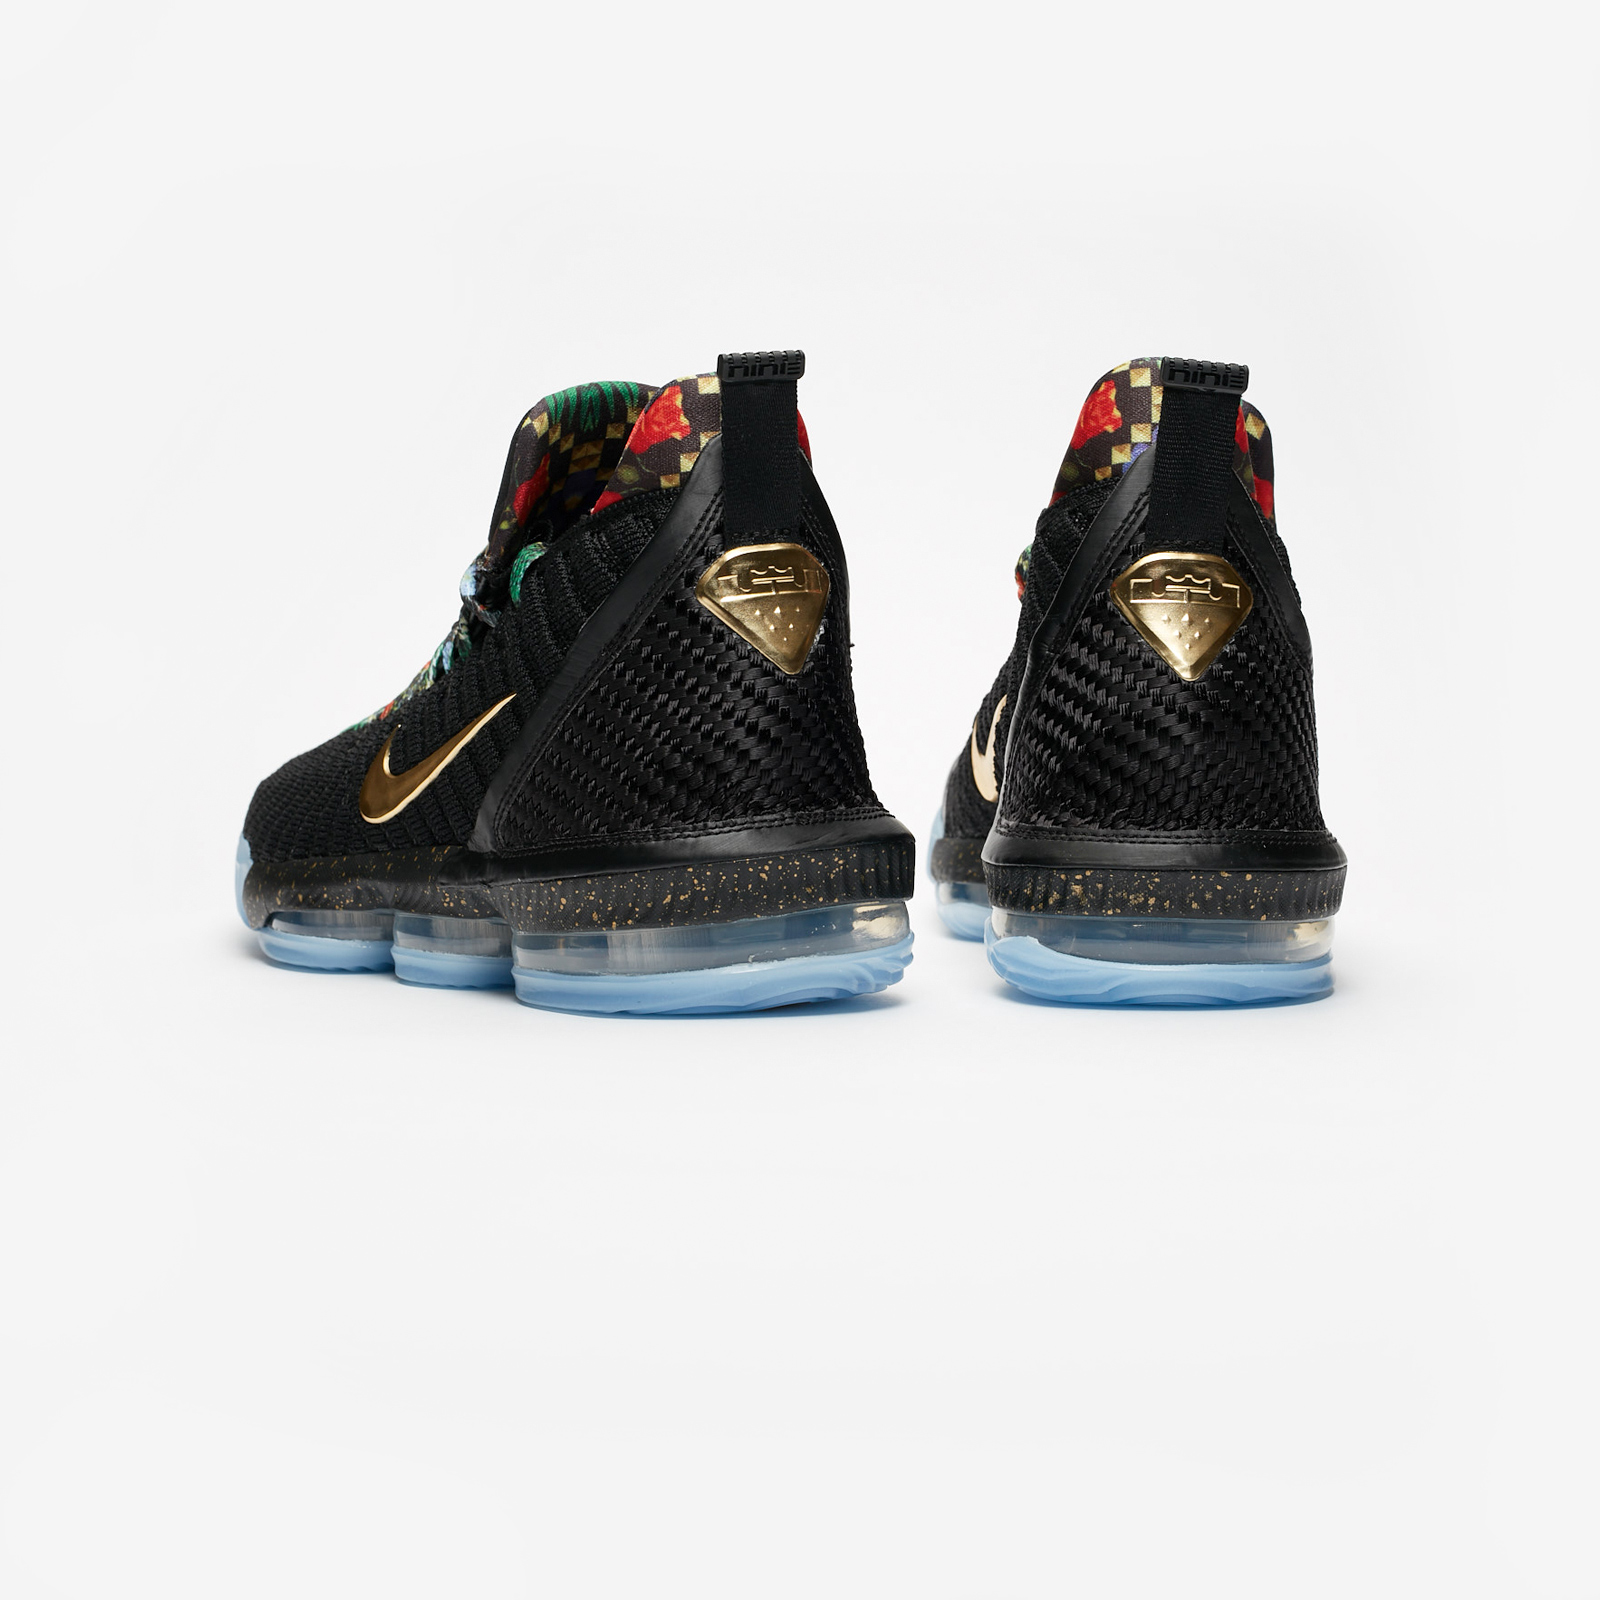 huge discount c4015 59c67 Nike Lebron XVI KC - Ci1518-001 - Sneakersnstuff   sneakers   streetwear på  nätet sen 1999